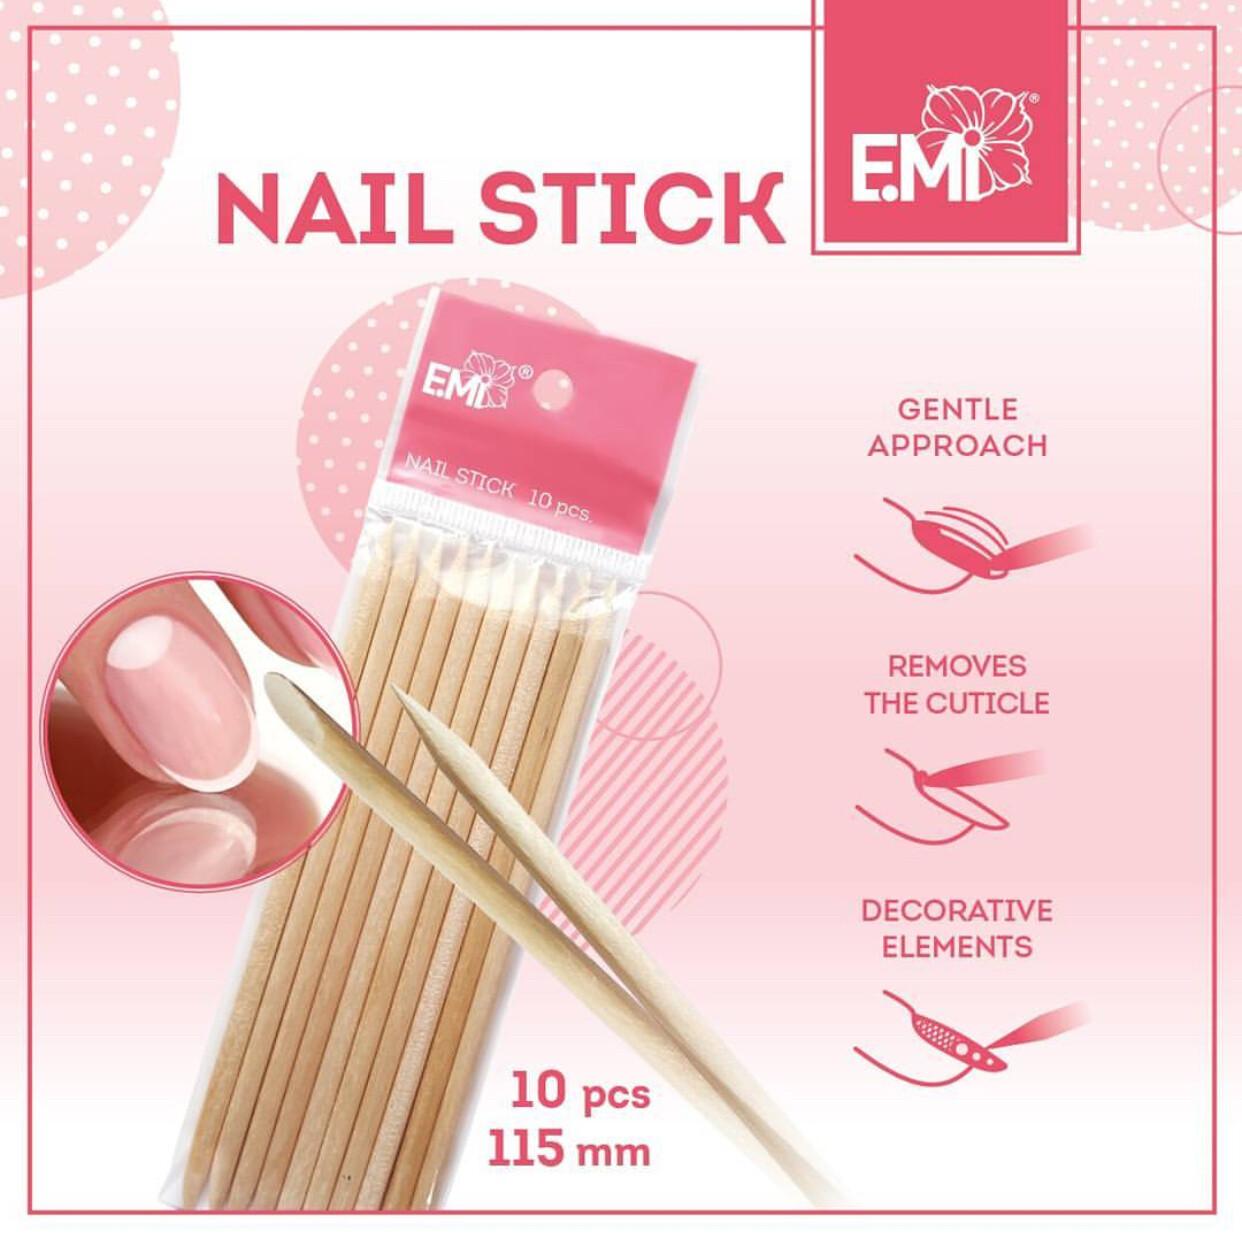 Nail Stick 10 pcs